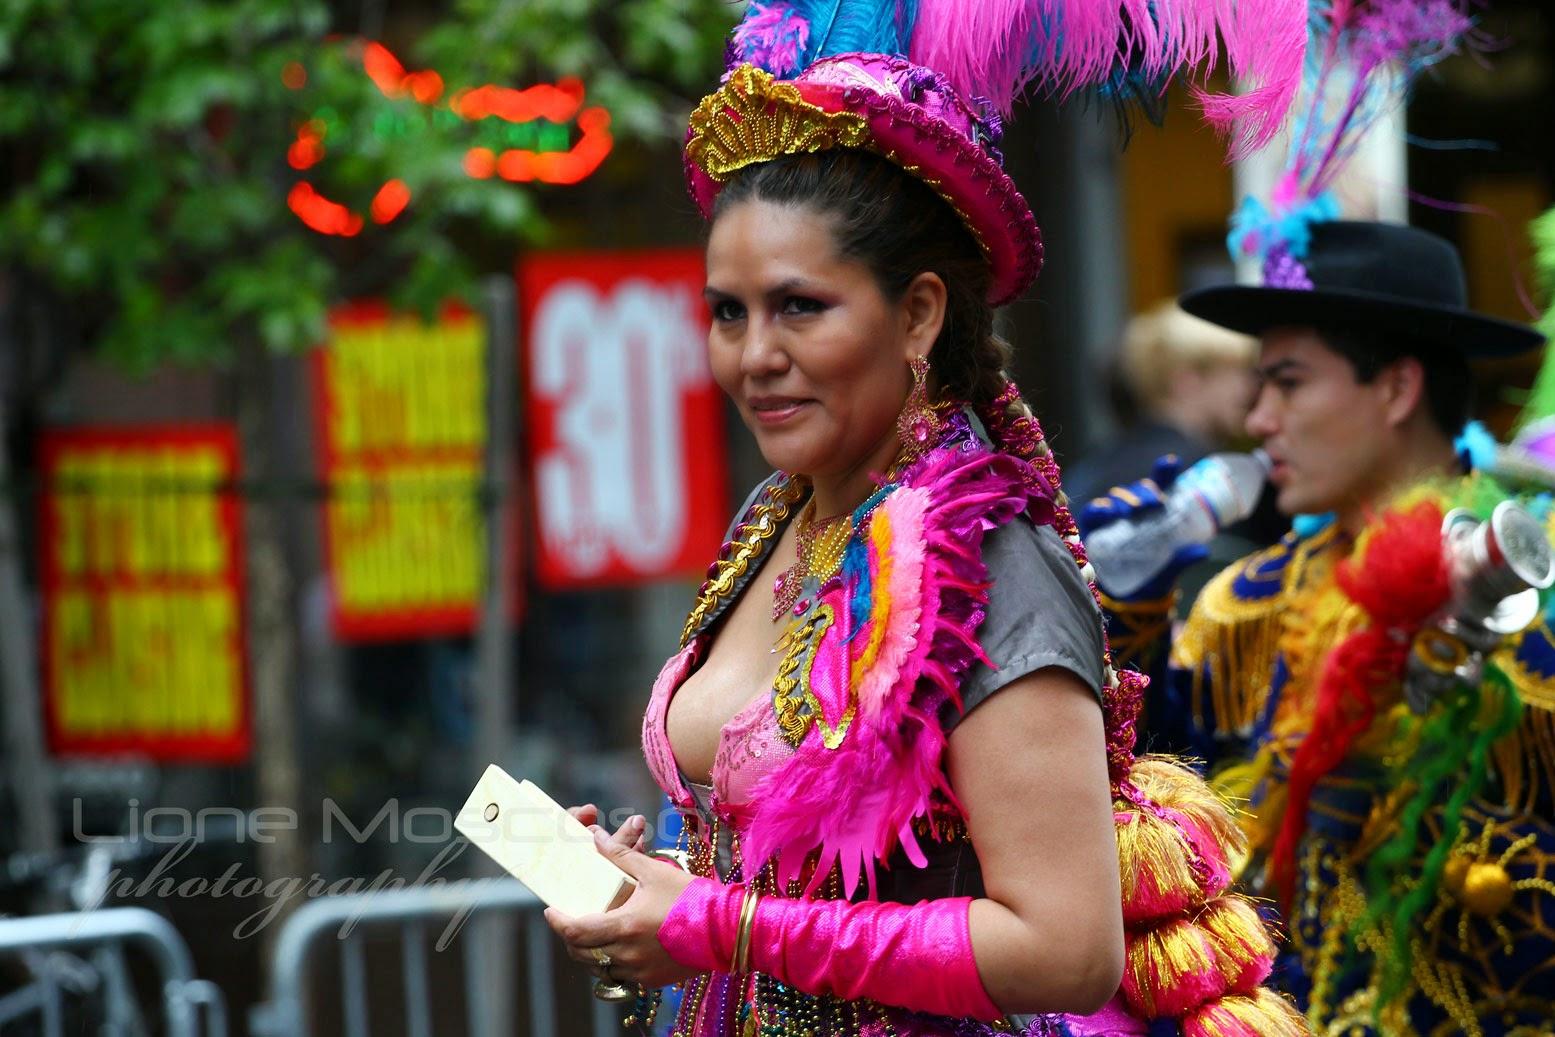 cultura folklorica boliviana - Morenada